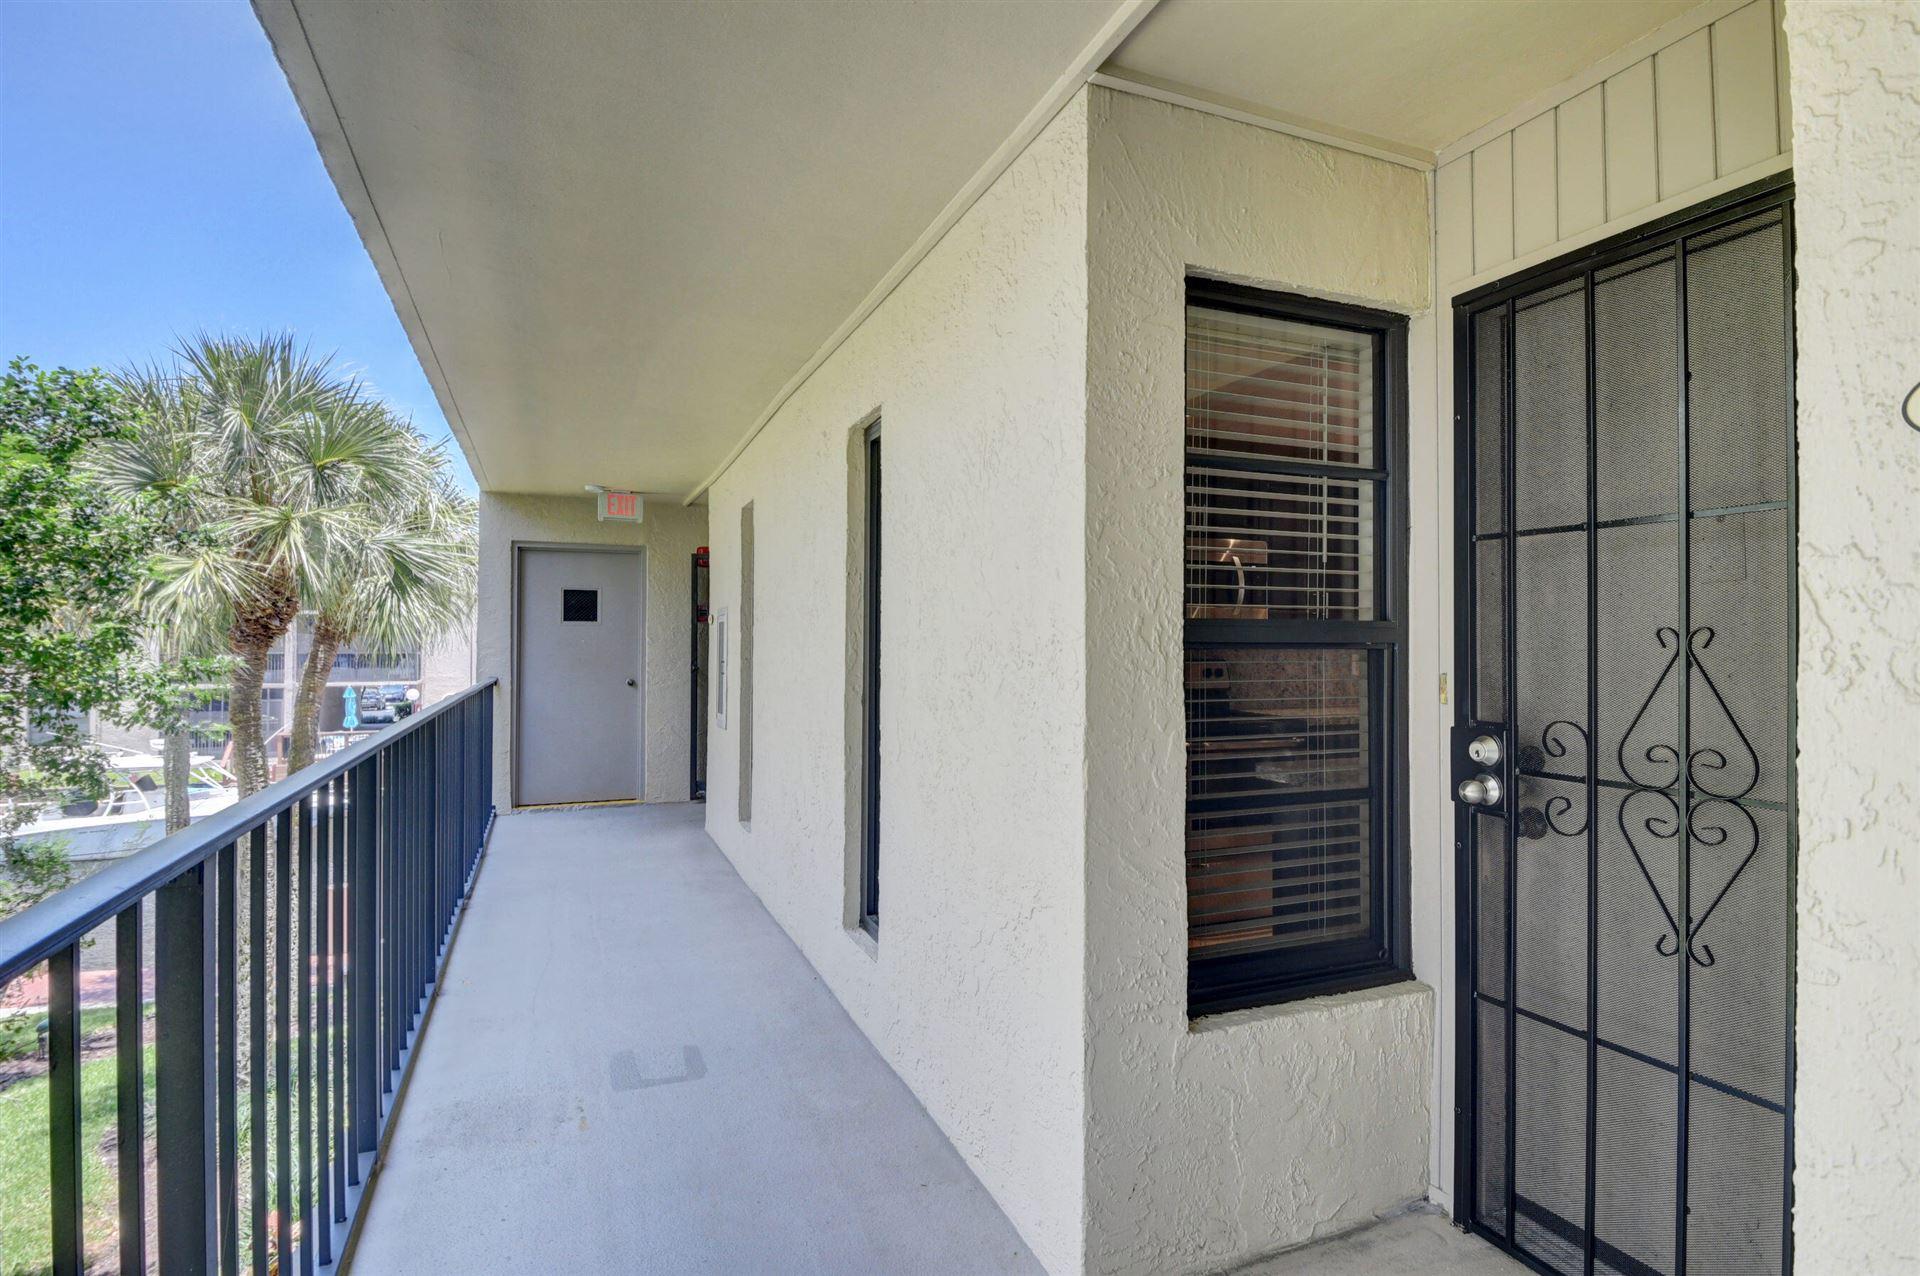 Photo of 18 Royal Palm Way #202, Boca Raton, FL 33432 (MLS # RX-10735138)